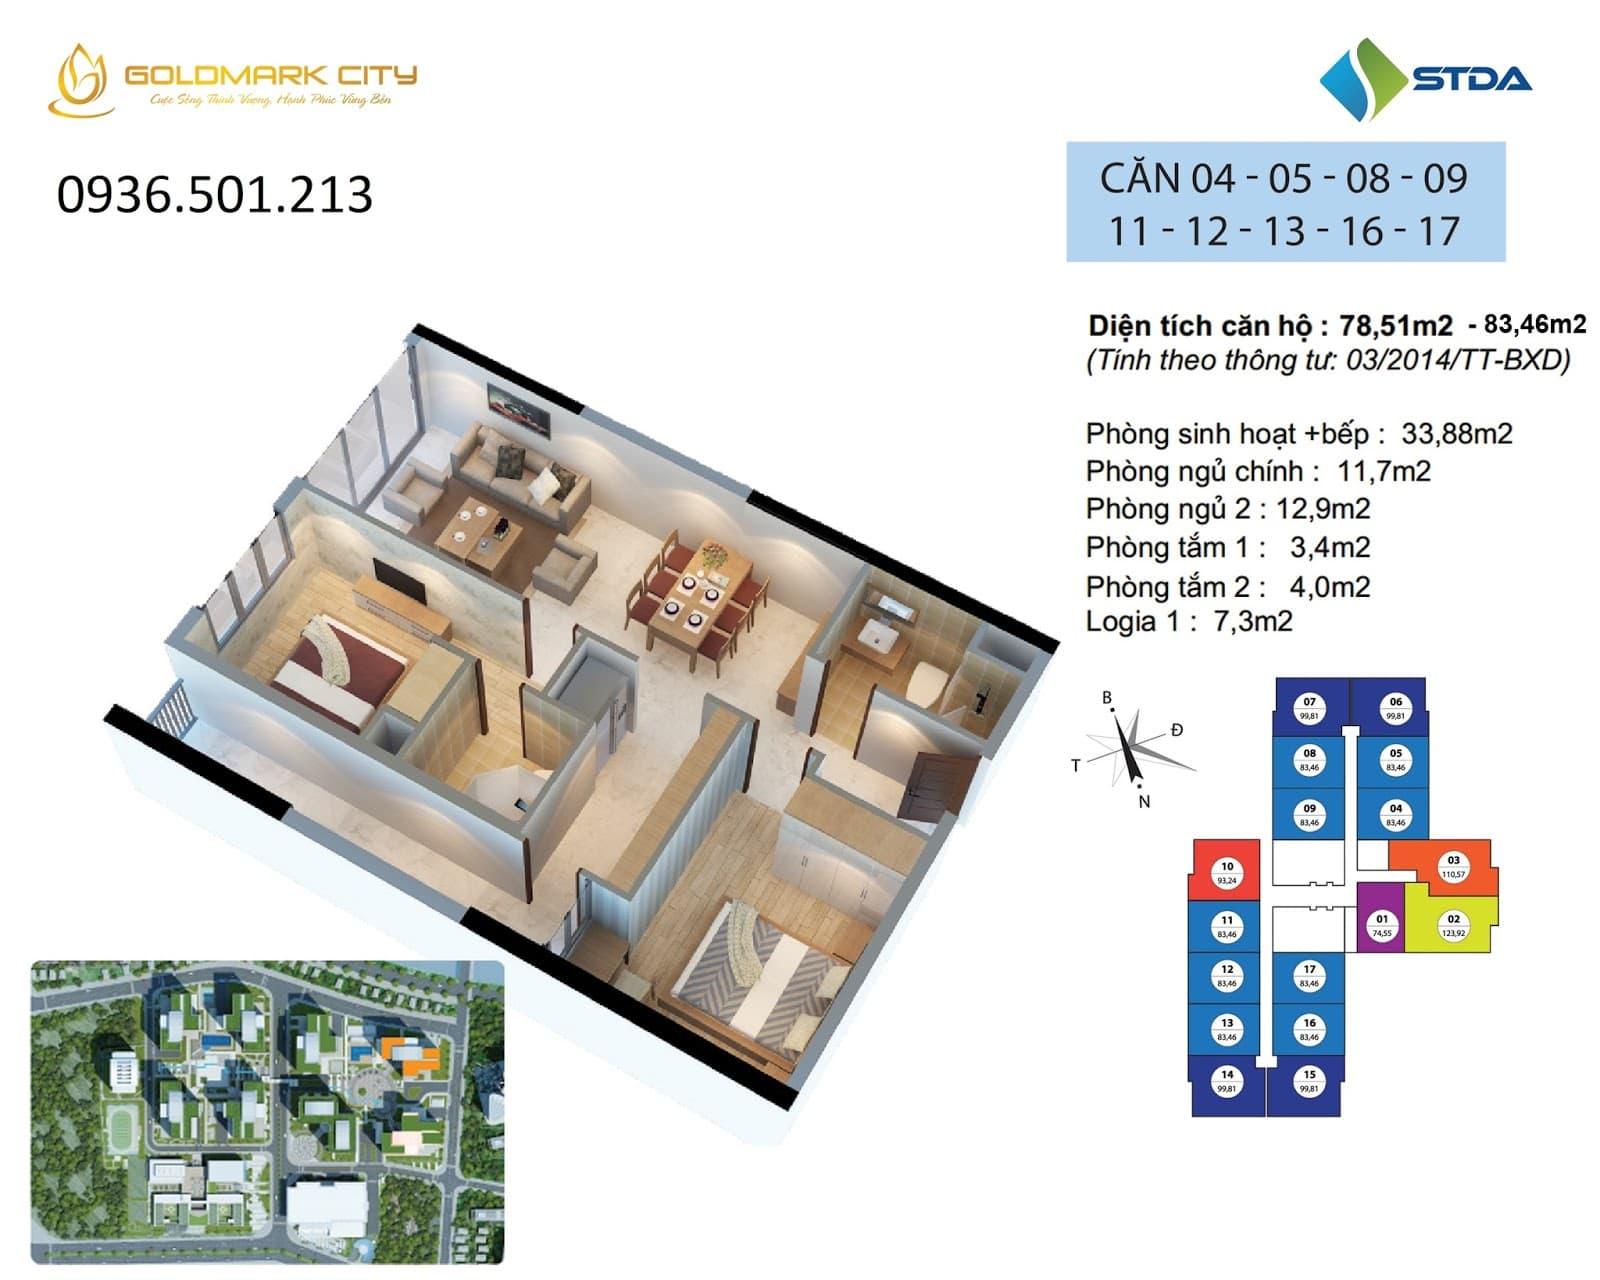 Mặt bằng căn hộ số 04-05-08-09-11-12-13-16-17 Ruby 2- Goldmark city 136 Hồ Tùng Mậu